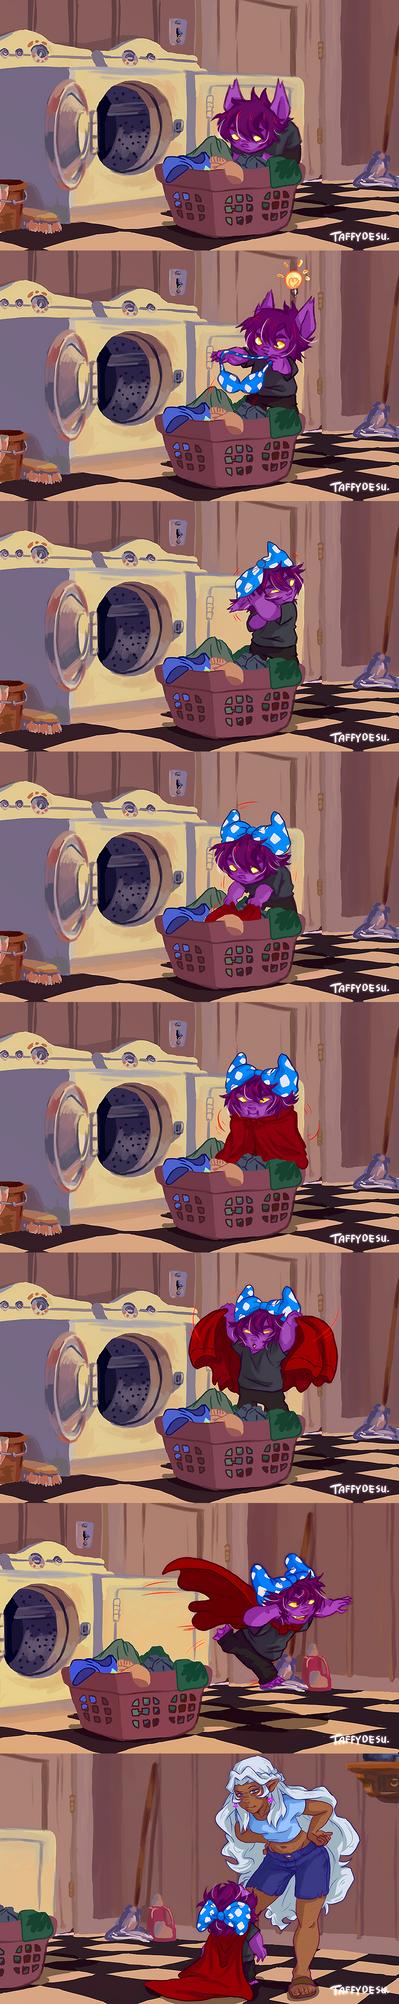 Voltron Lilo and Stitch AU by TaffyDesu